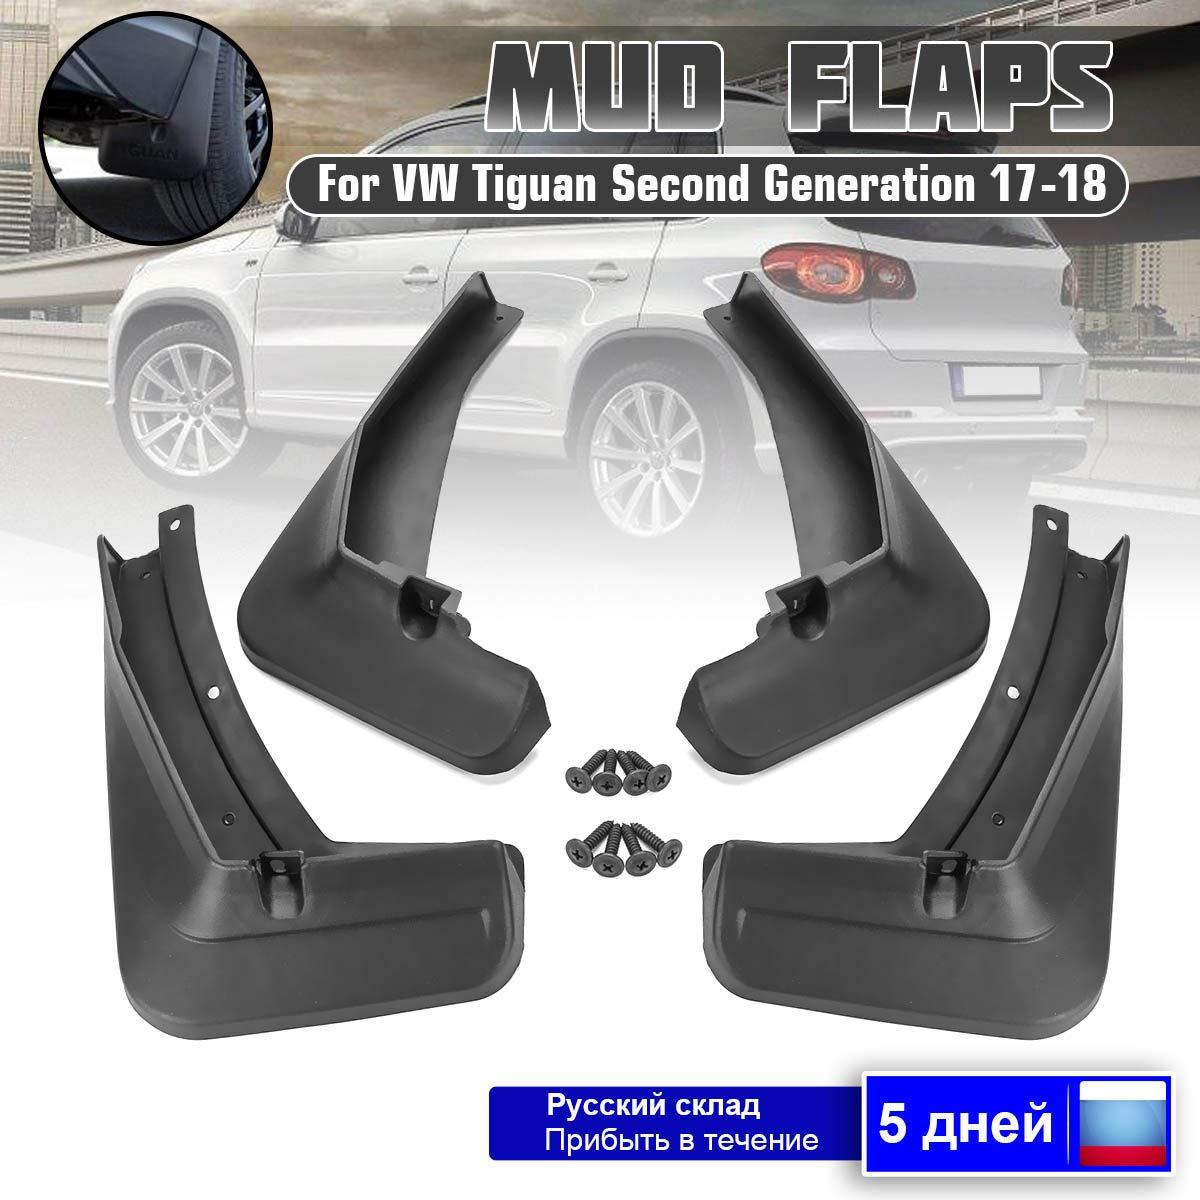 BTSDLXX 4 Pcs Set Coche Guardabarros para VW Tiguan//Tiguan L 2017 2018 Delanteros Traseros Goma Barro Aletas Protectores contra Salpicaduras Accesorios